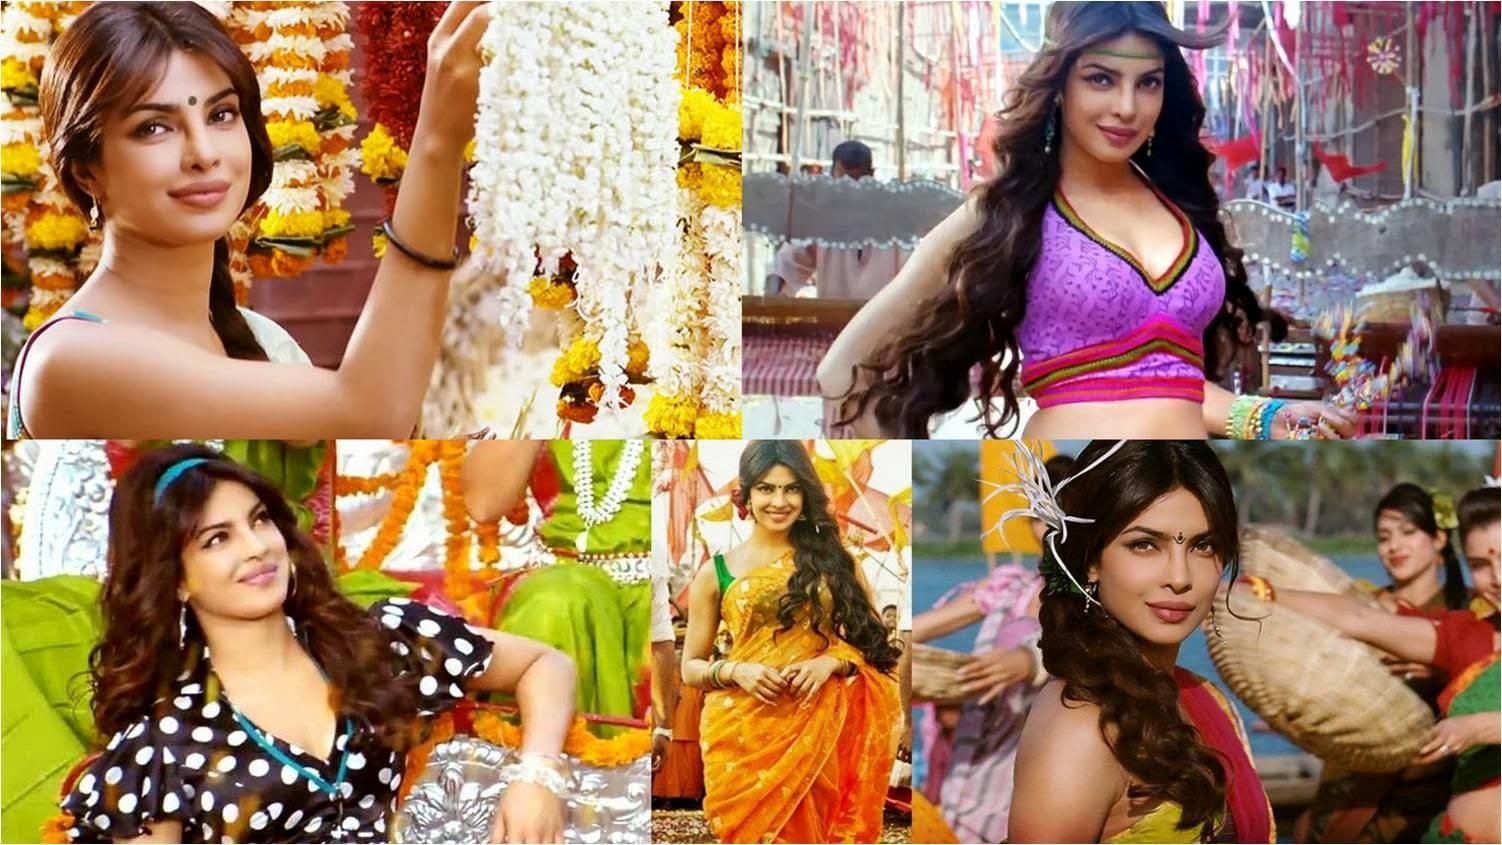 Gunday movie heroine Priyanka Chopra as Nandita